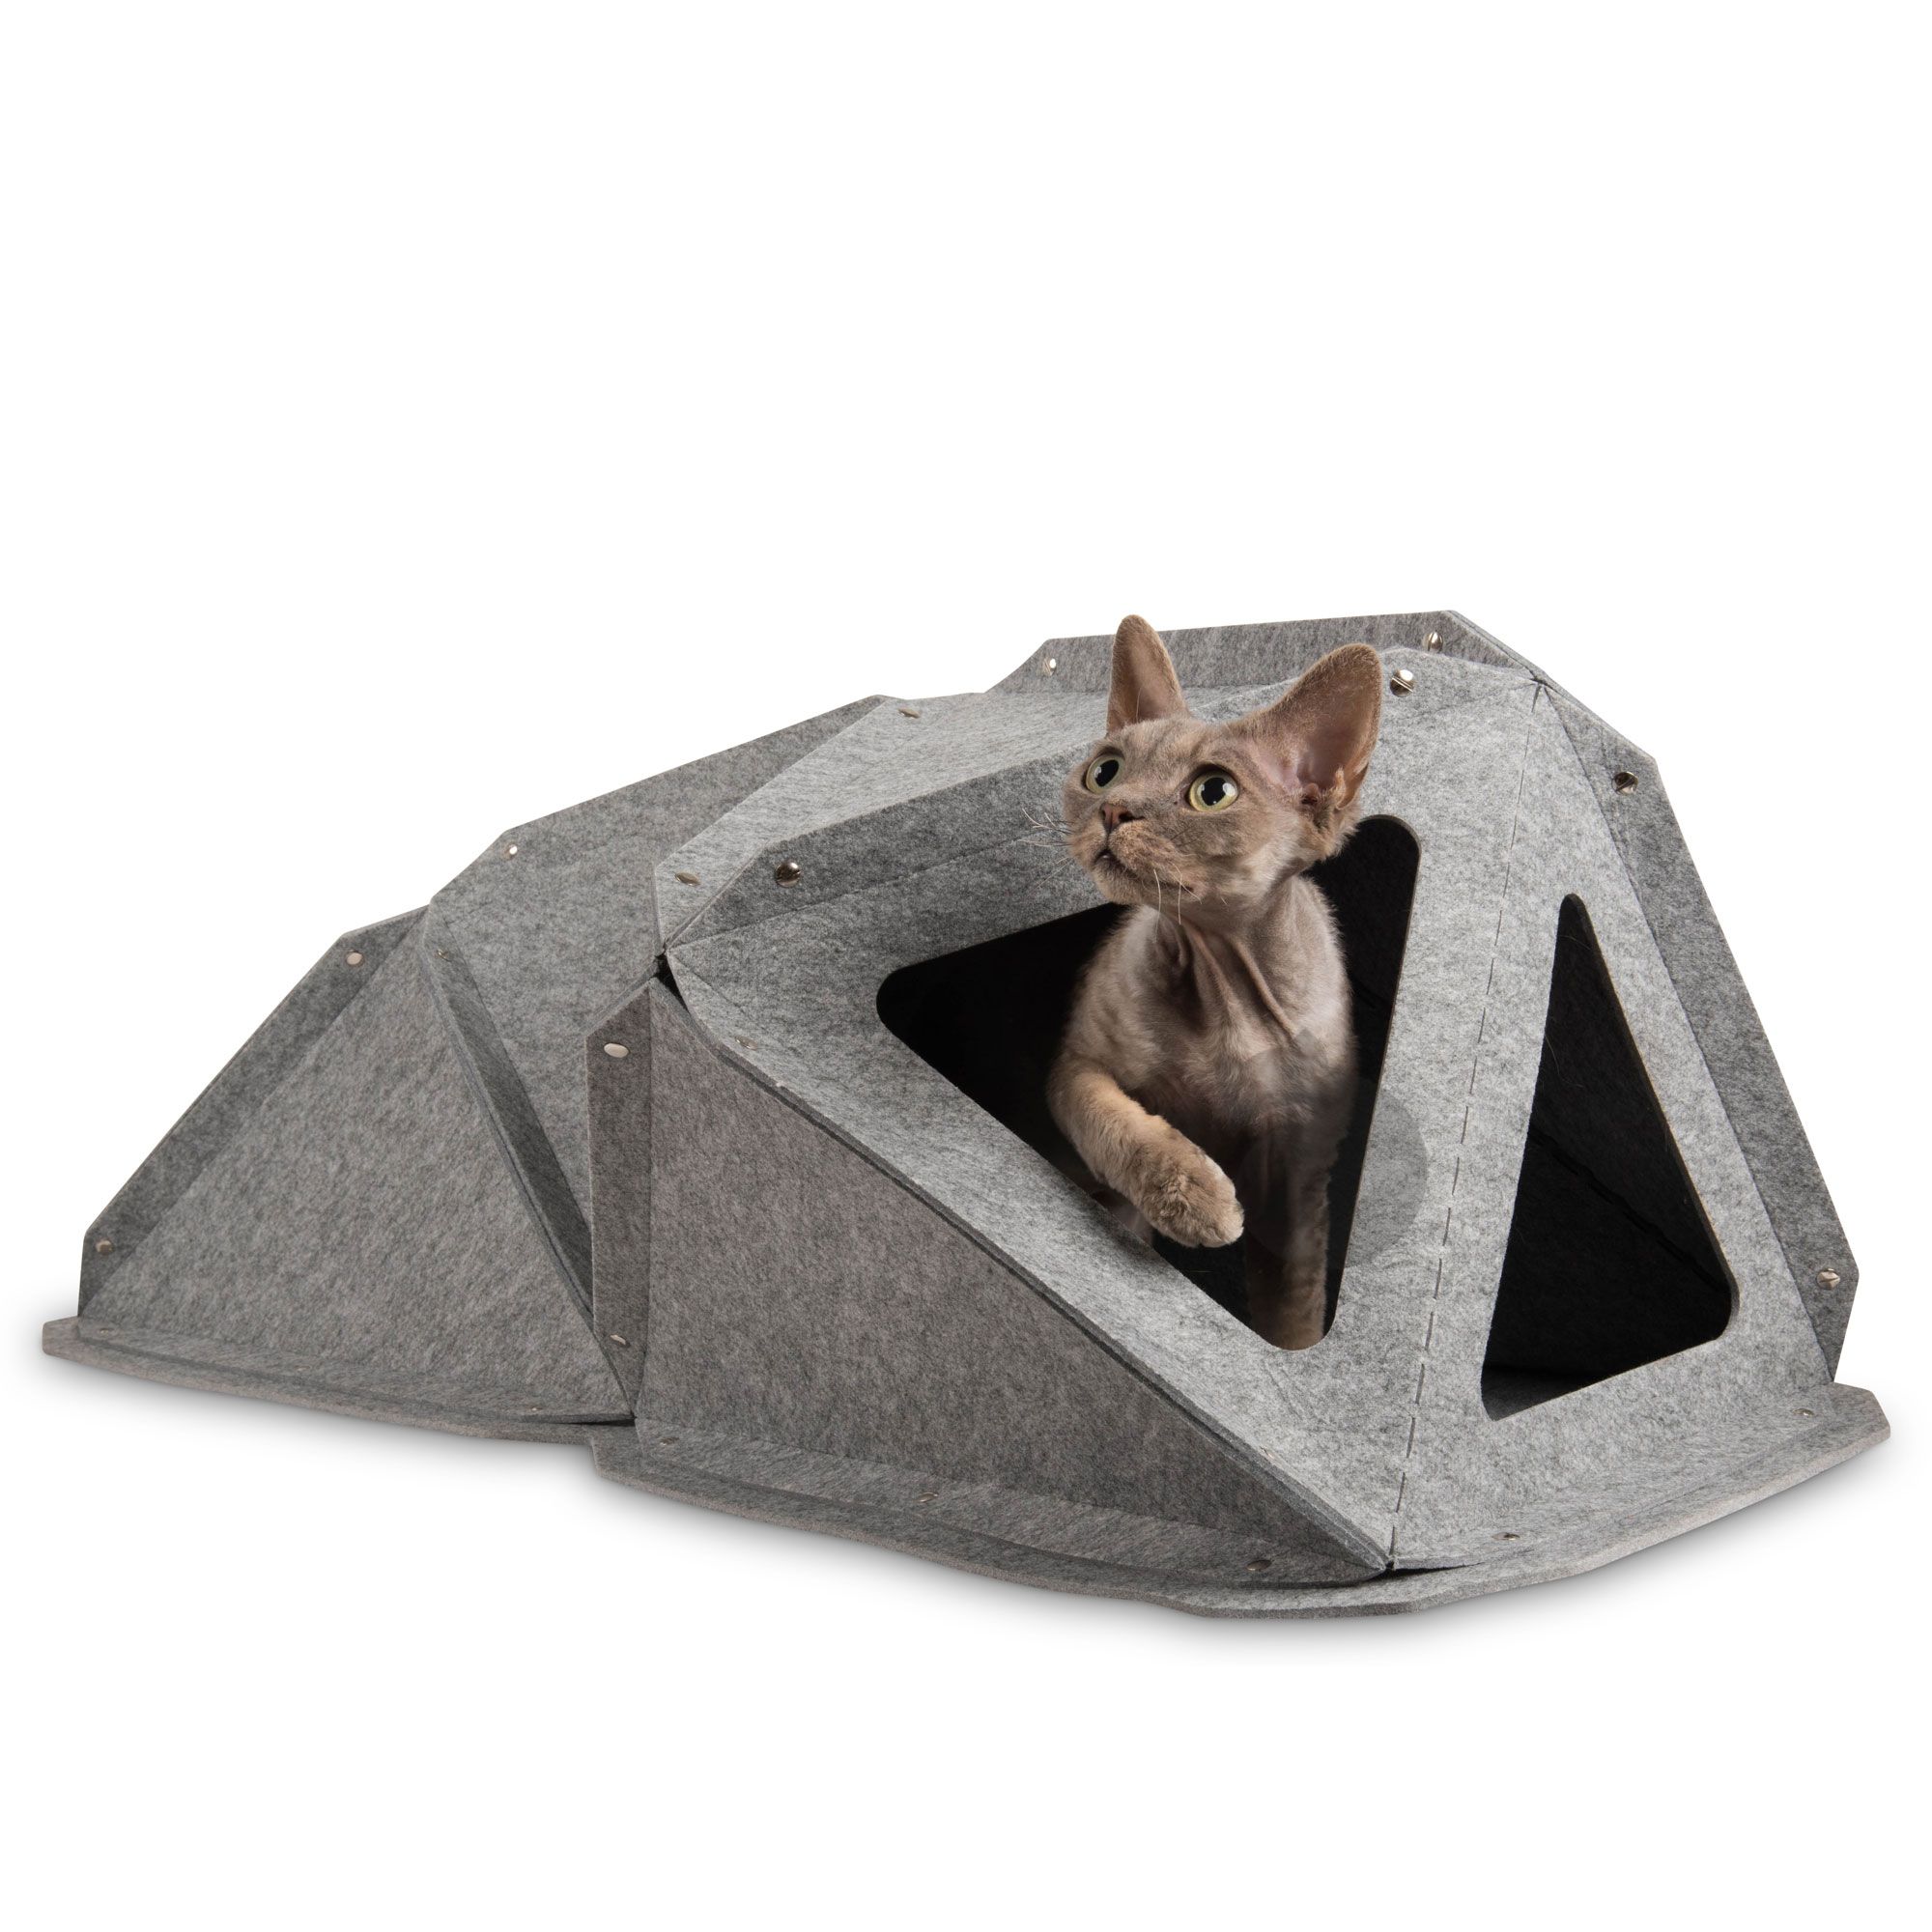 miut modulare katzenm bel aus filz zur wandmontage. Black Bedroom Furniture Sets. Home Design Ideas